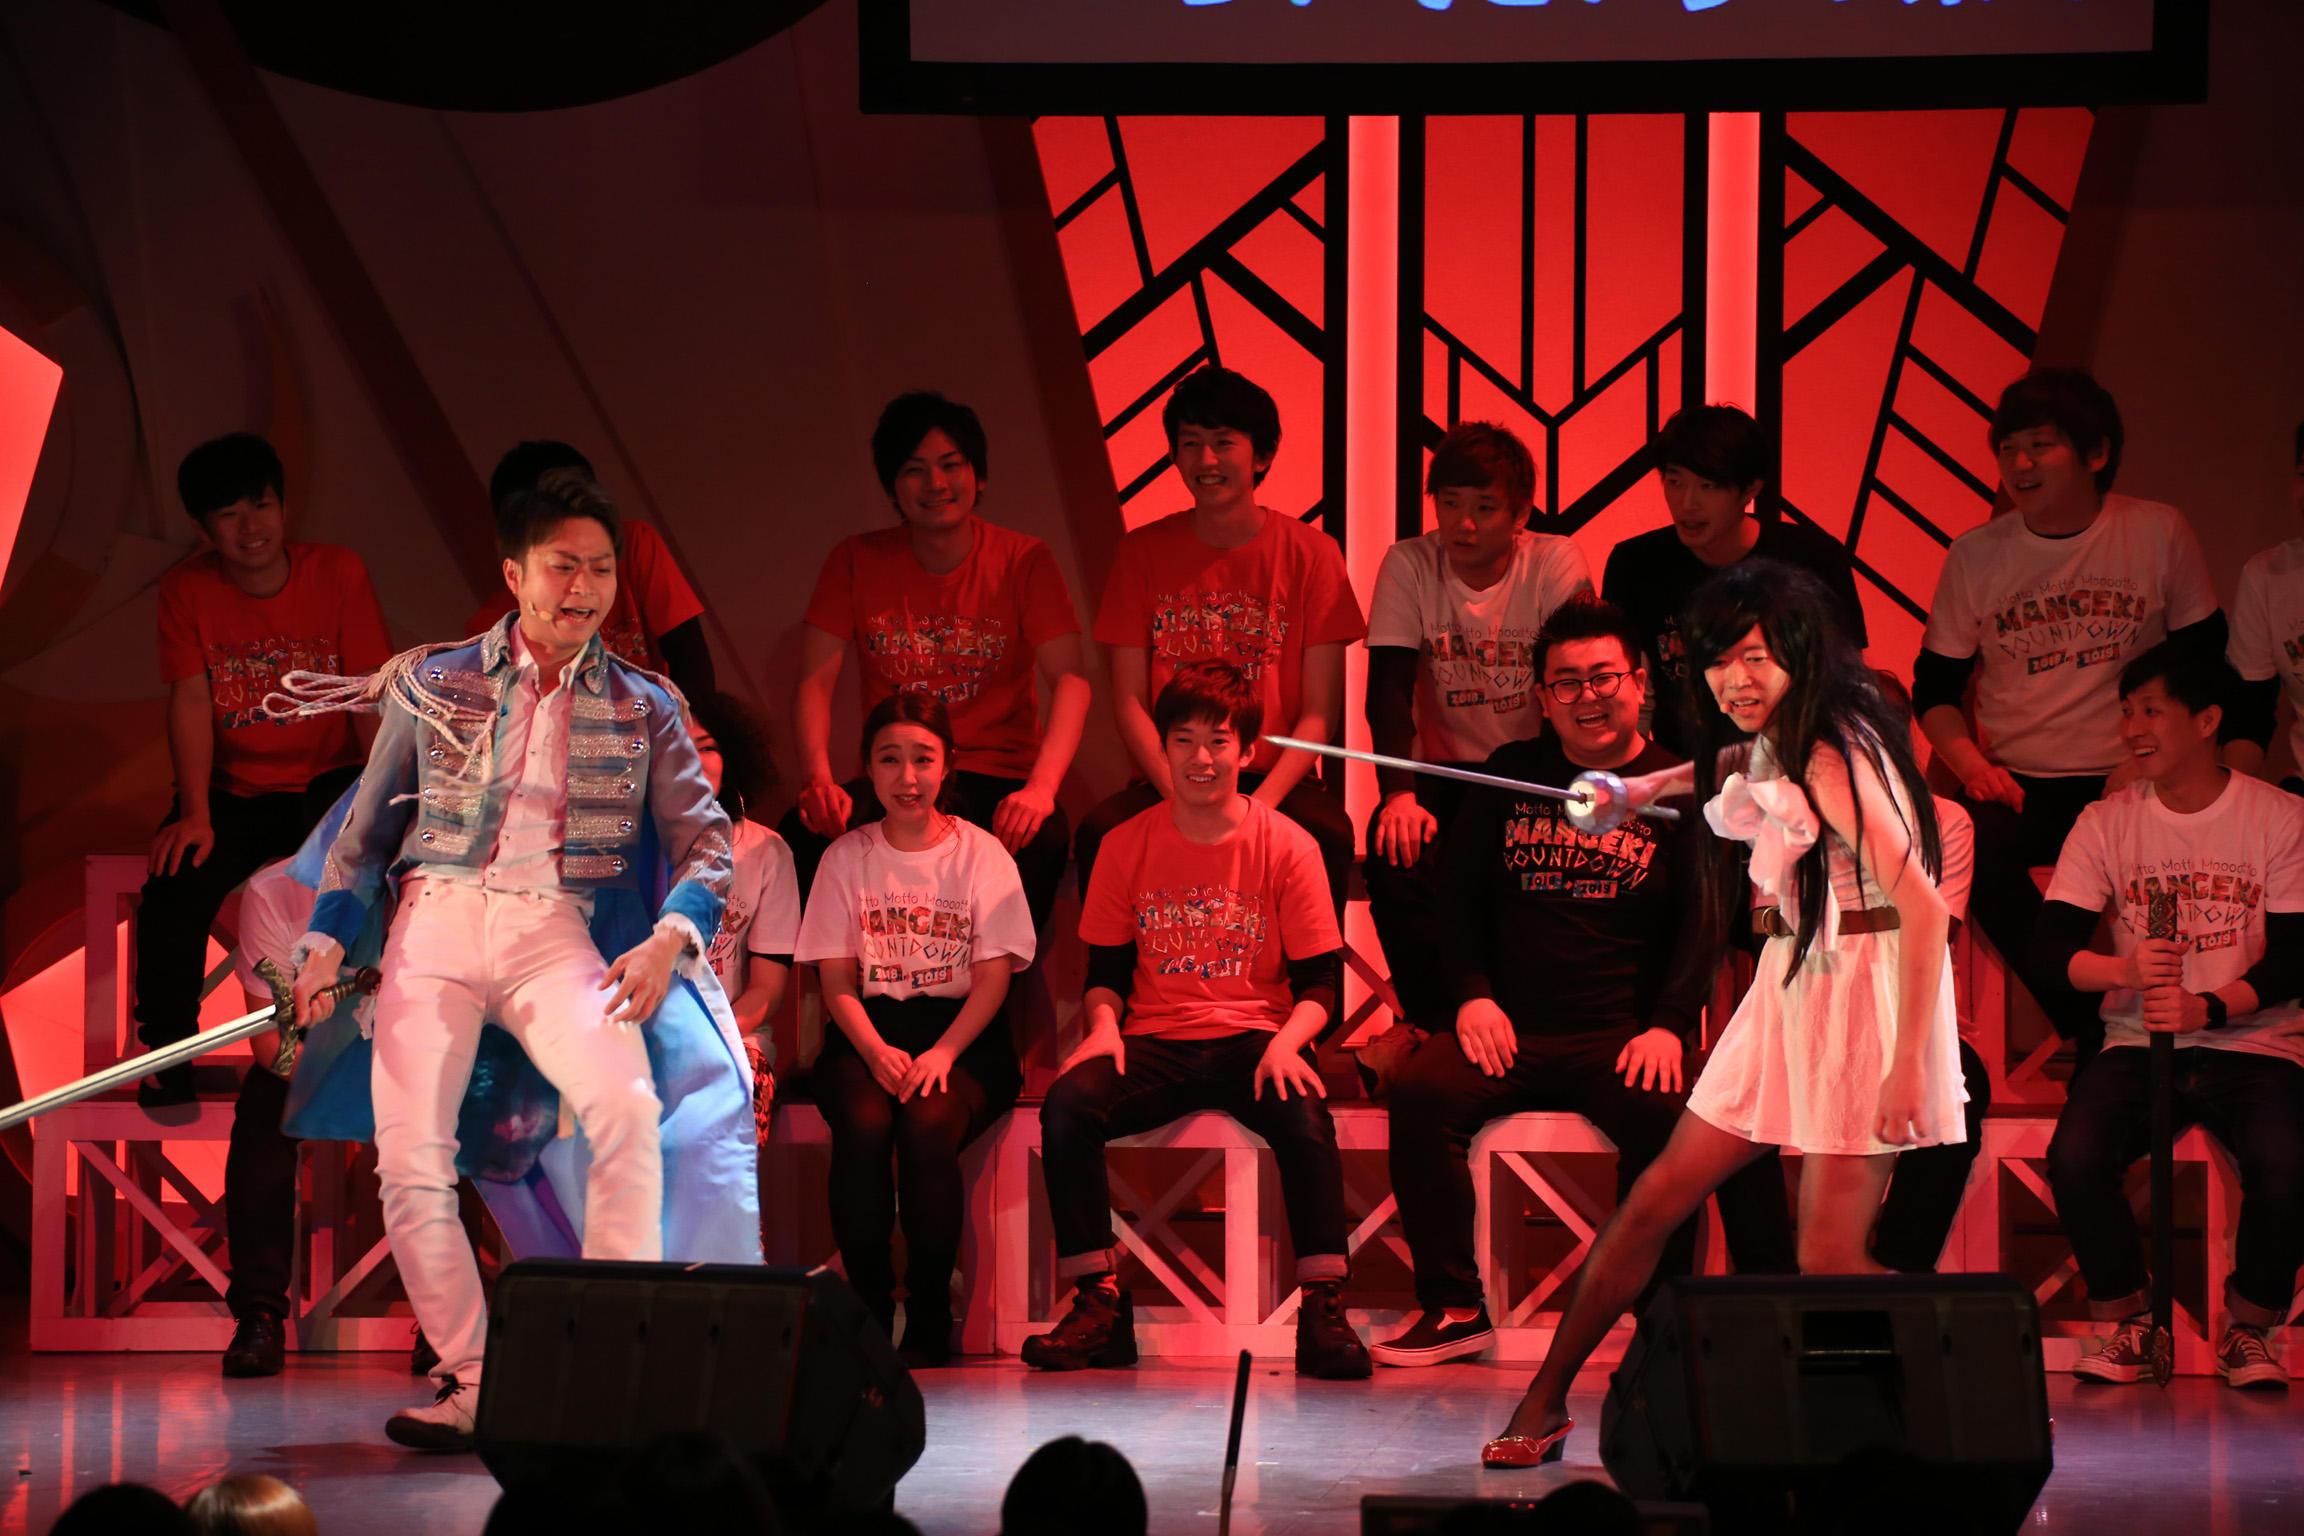 http://news.yoshimoto.co.jp/20190101104915-3354fe1000bee8c1c9da47703c5de56b10fe969e.jpg